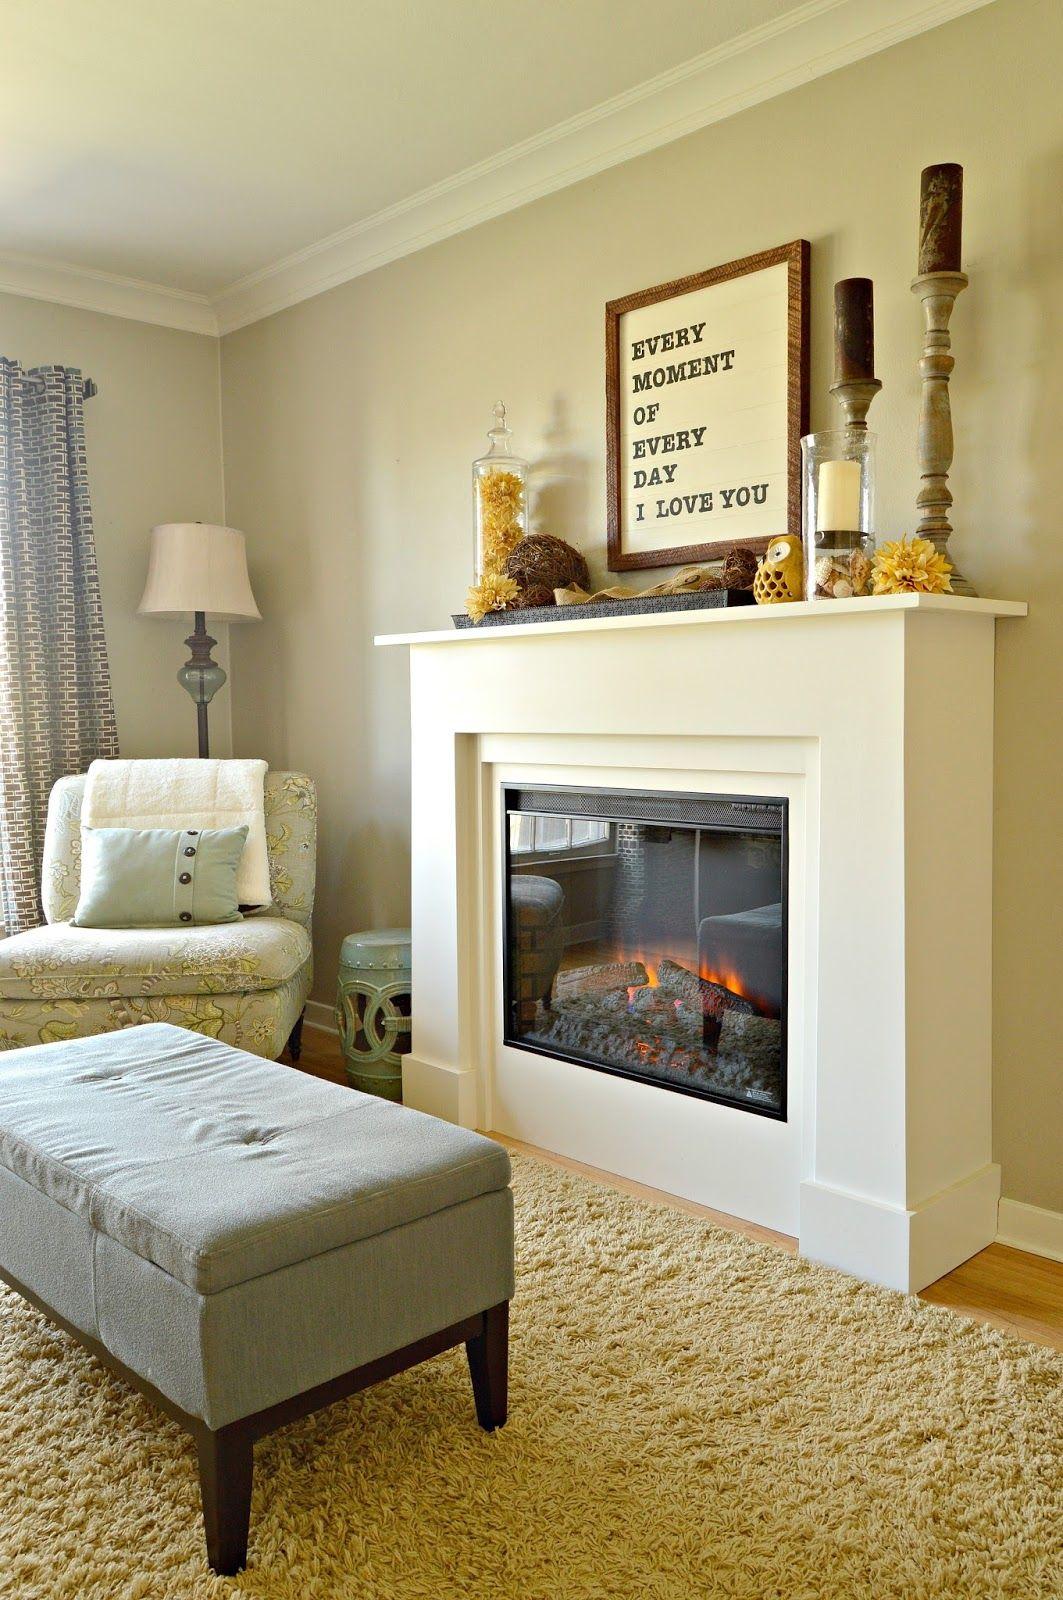 Custom Electric Fireplace Surround Fireplace surrounds